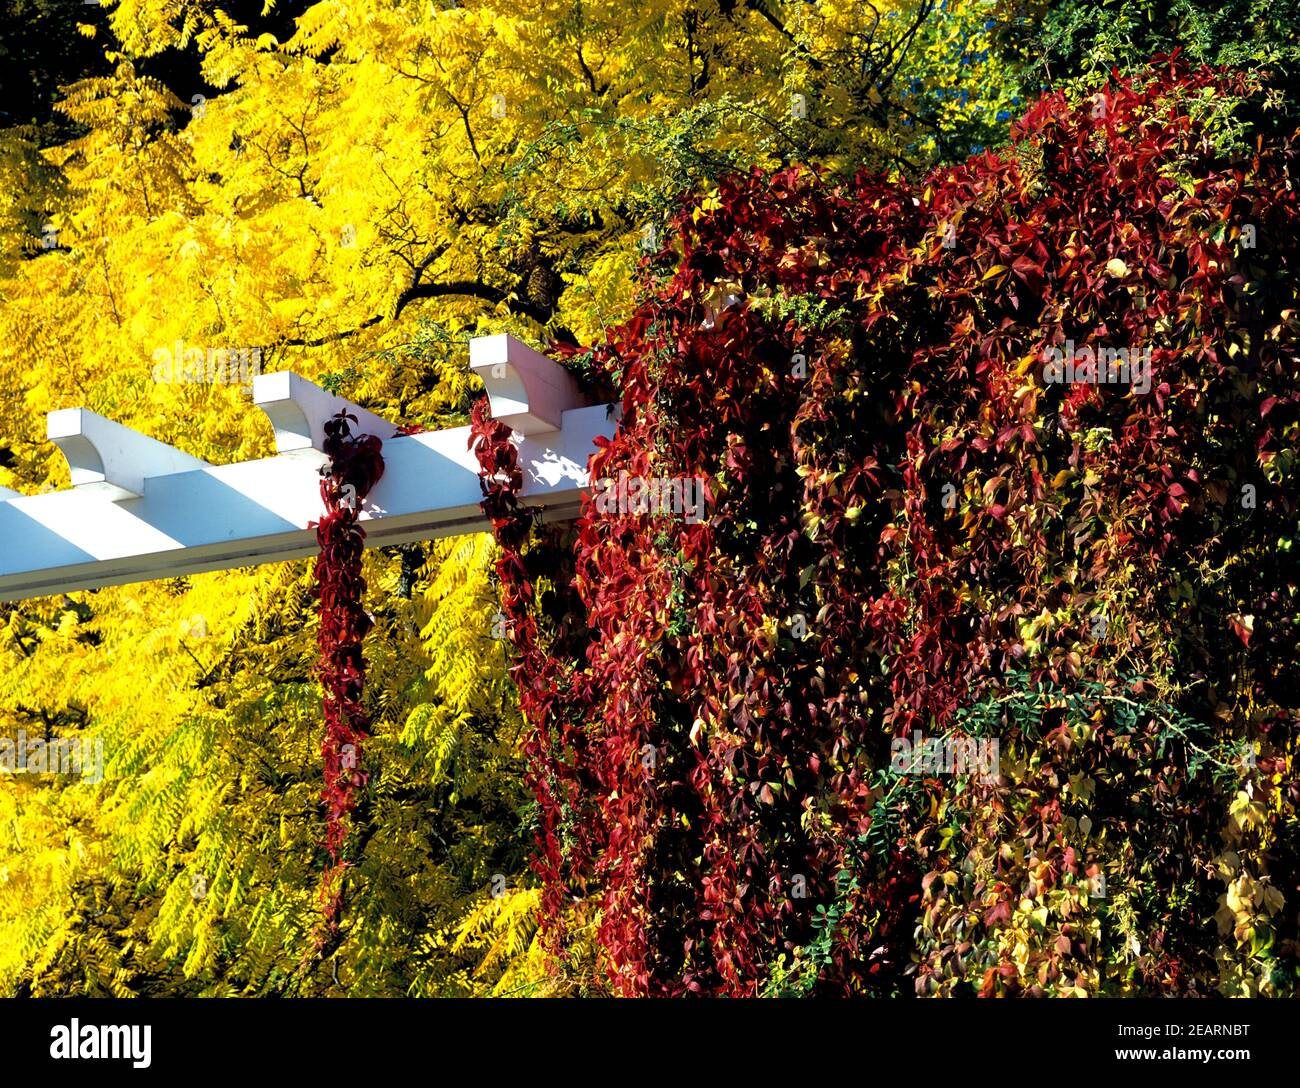 Herbstlaub, Herbstblaetter, Pergola Stock Photo